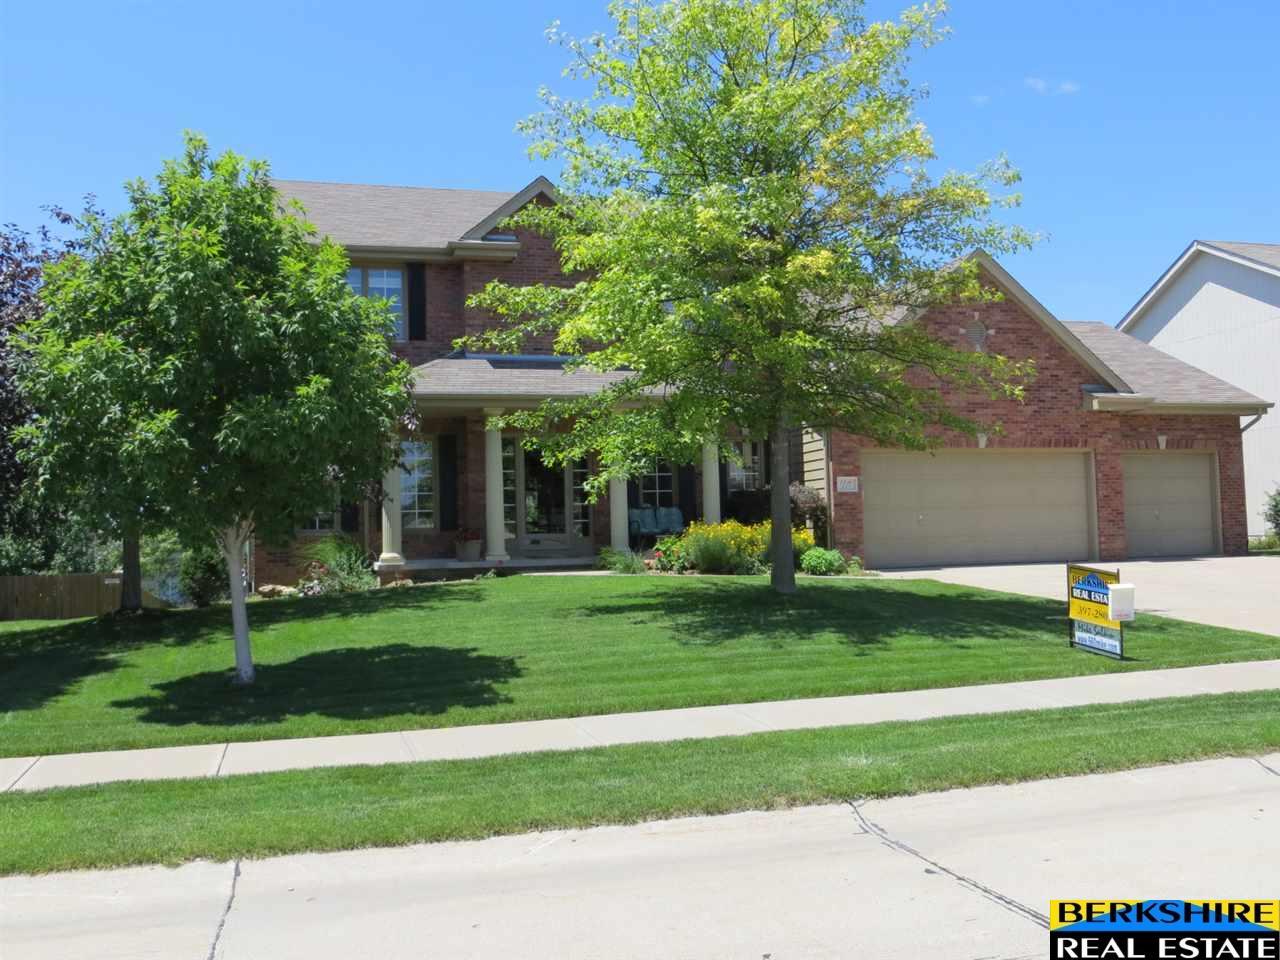 Real Estate for Sale, ListingId: 34293096, La Vista,NE68128